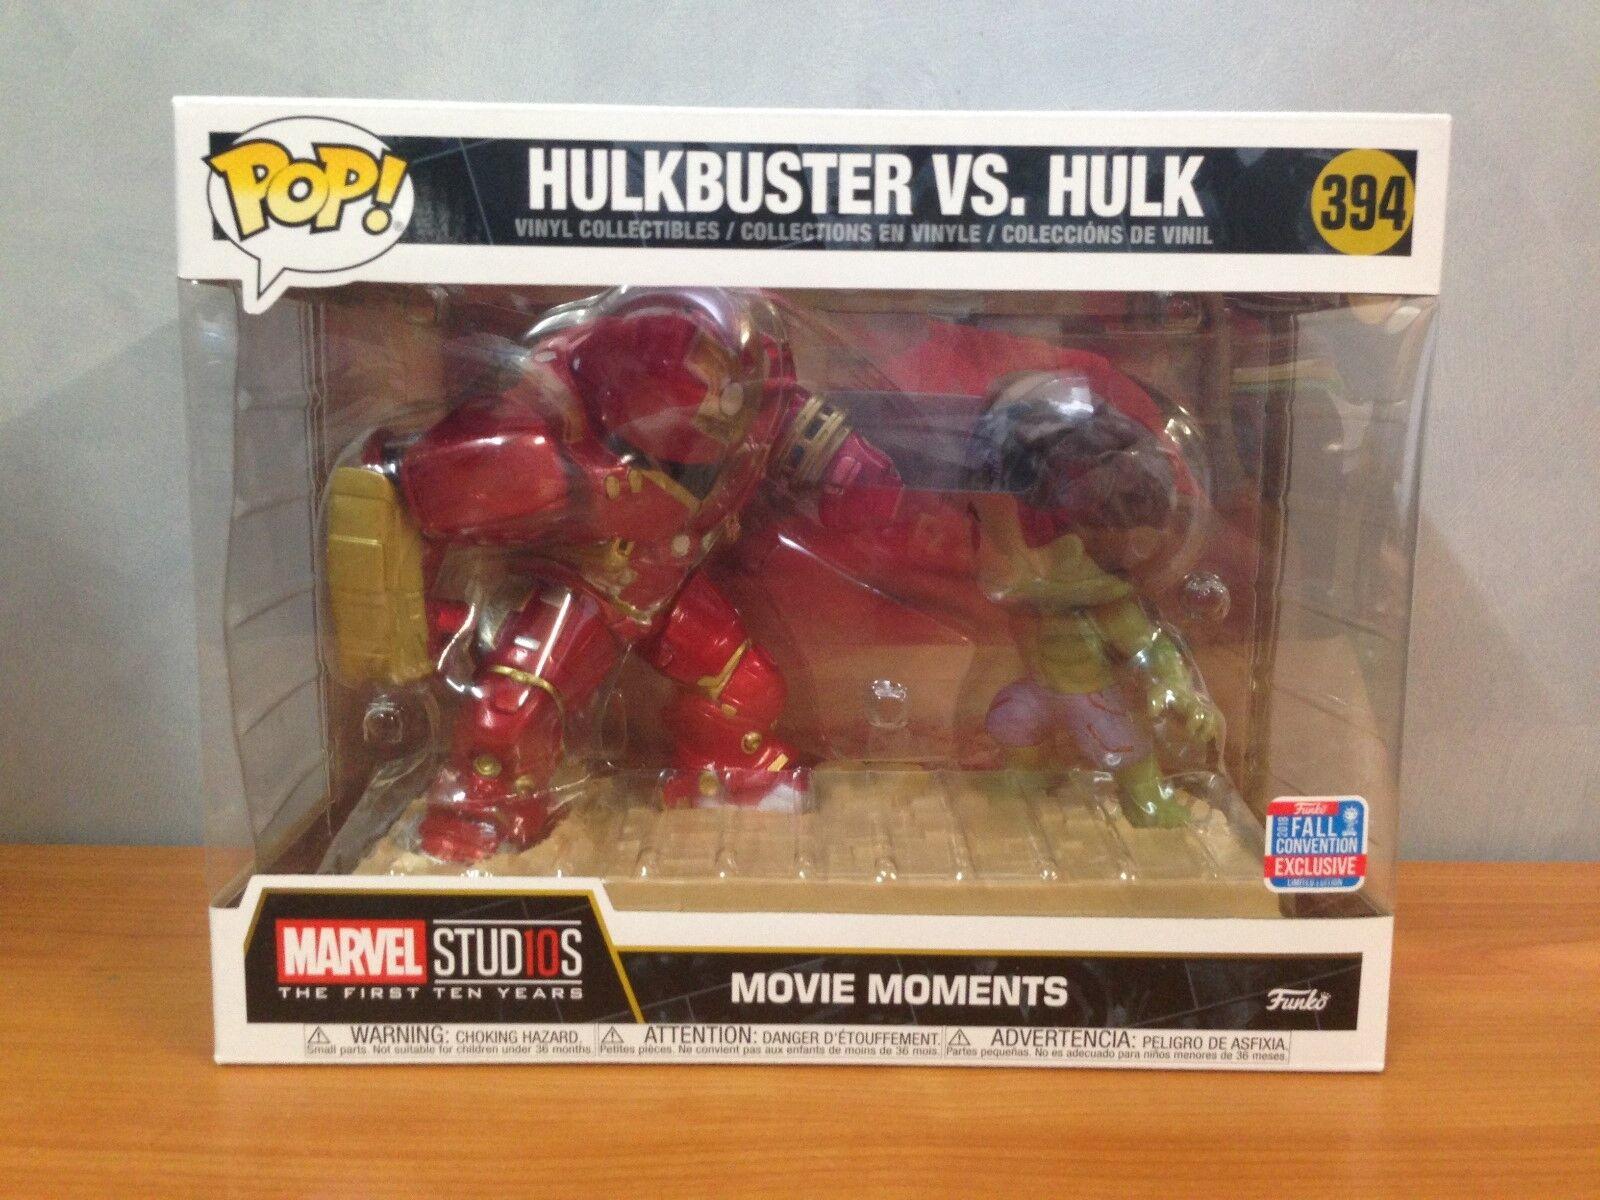 Marvel Studios Hulkbuster vs Hulk First 10 years - NYCC 2018 Funko Pop Vinyl